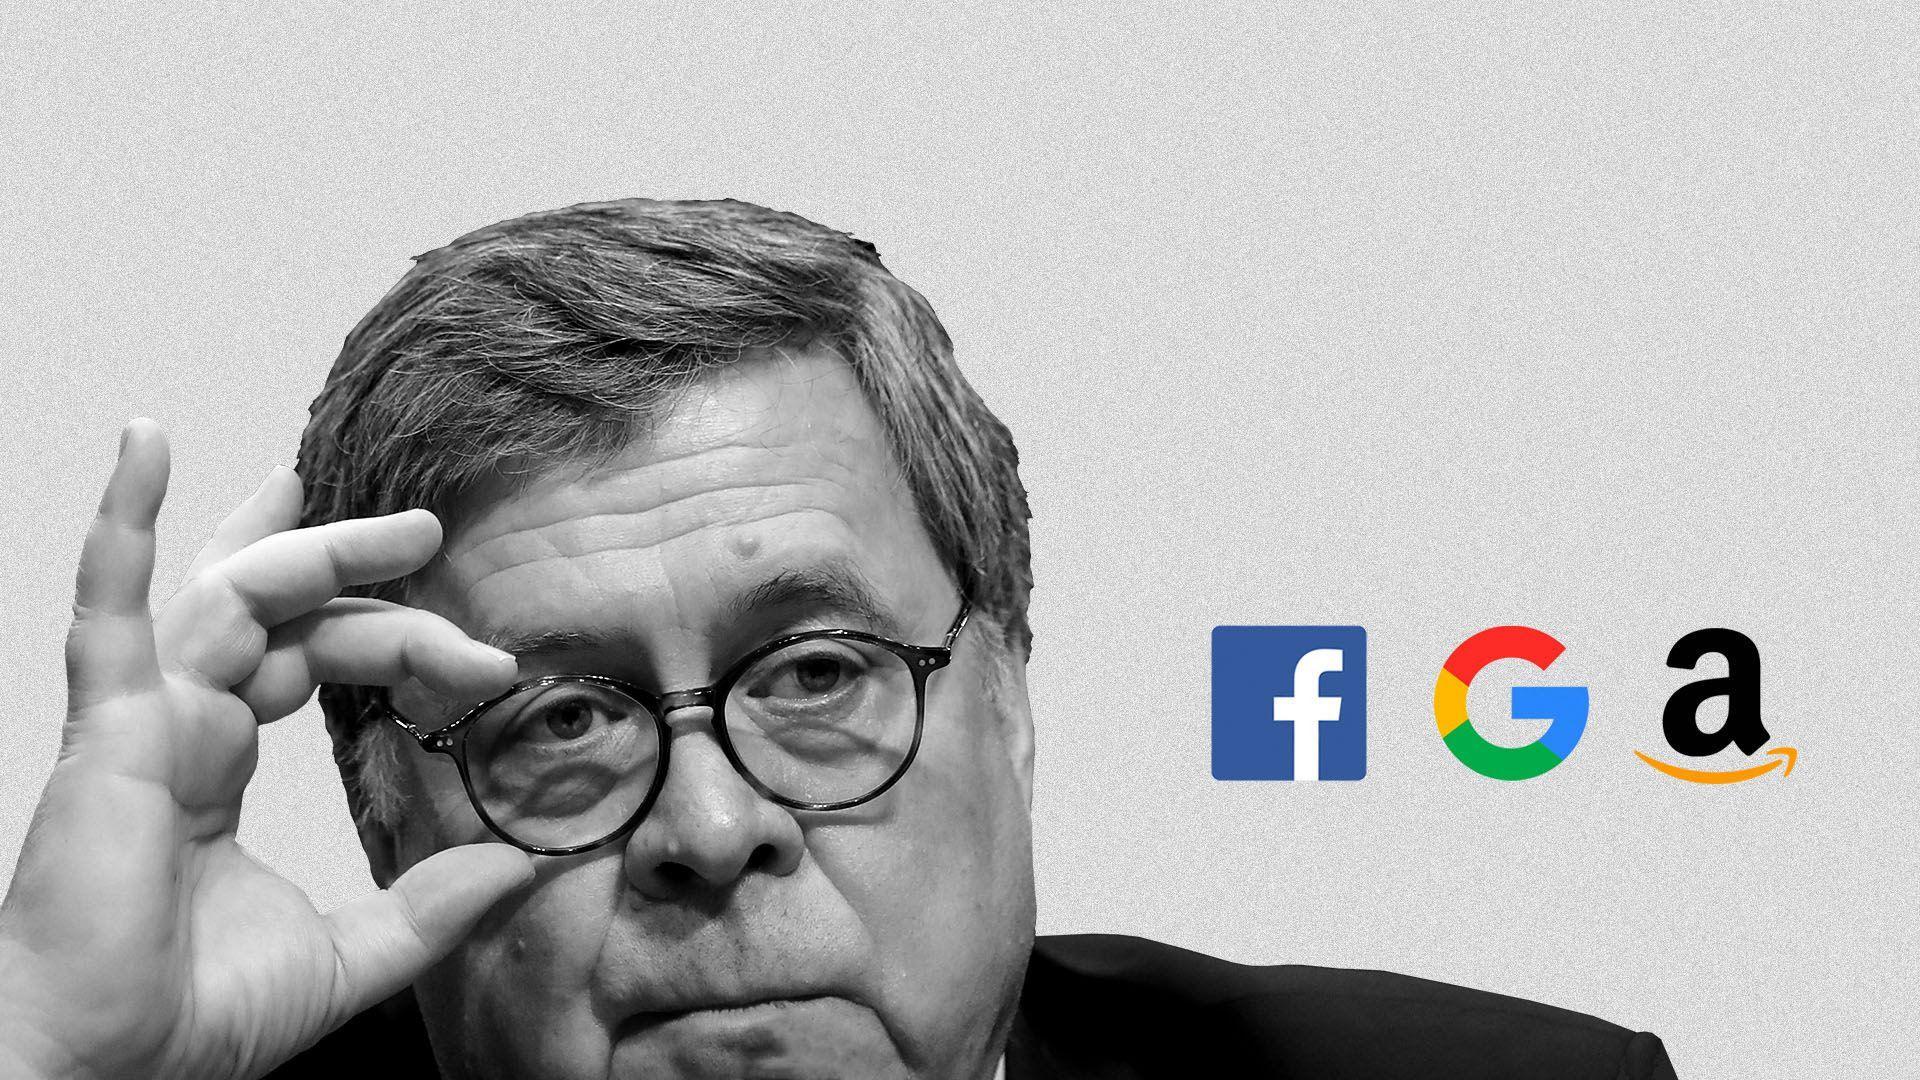 Bill Barr's attorney general confirmation hearing highlights Senate's Big Tech antitrust fears